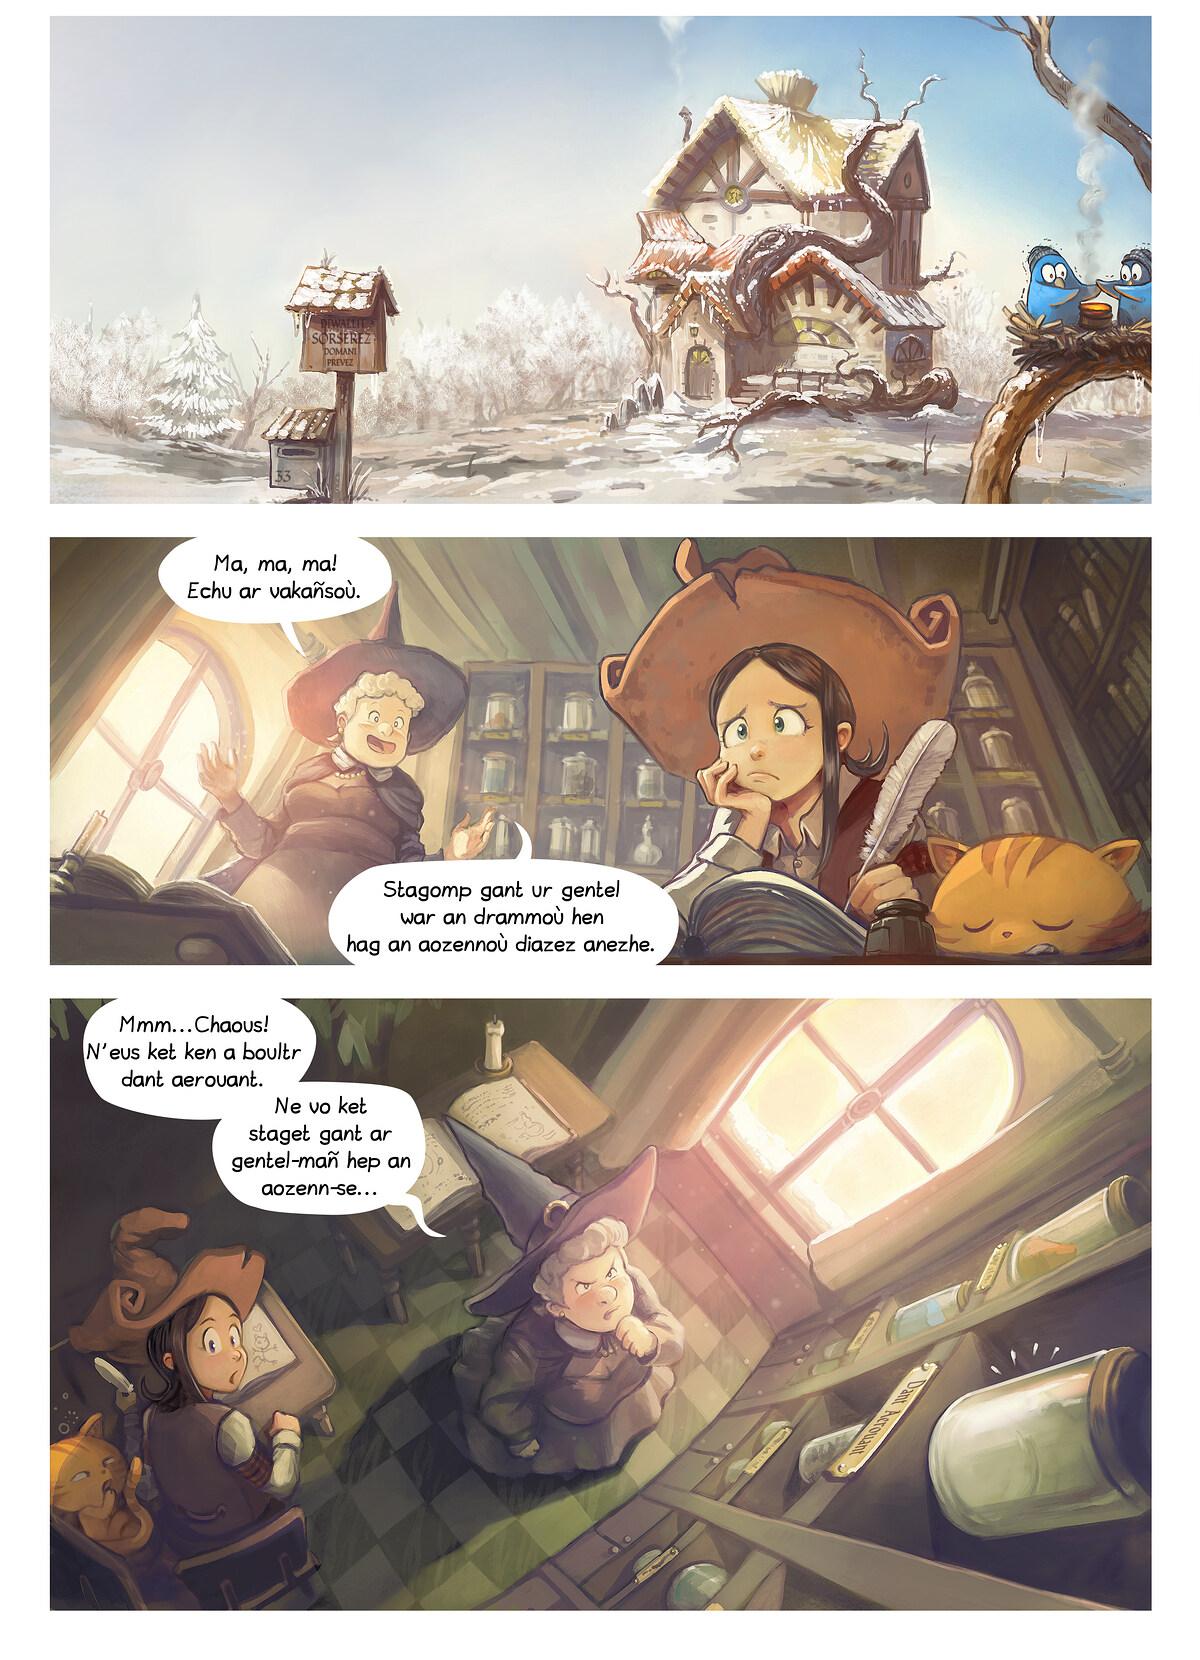 A webcomic page of Pepper&Carrot, rann 14 [br], pajenn 1